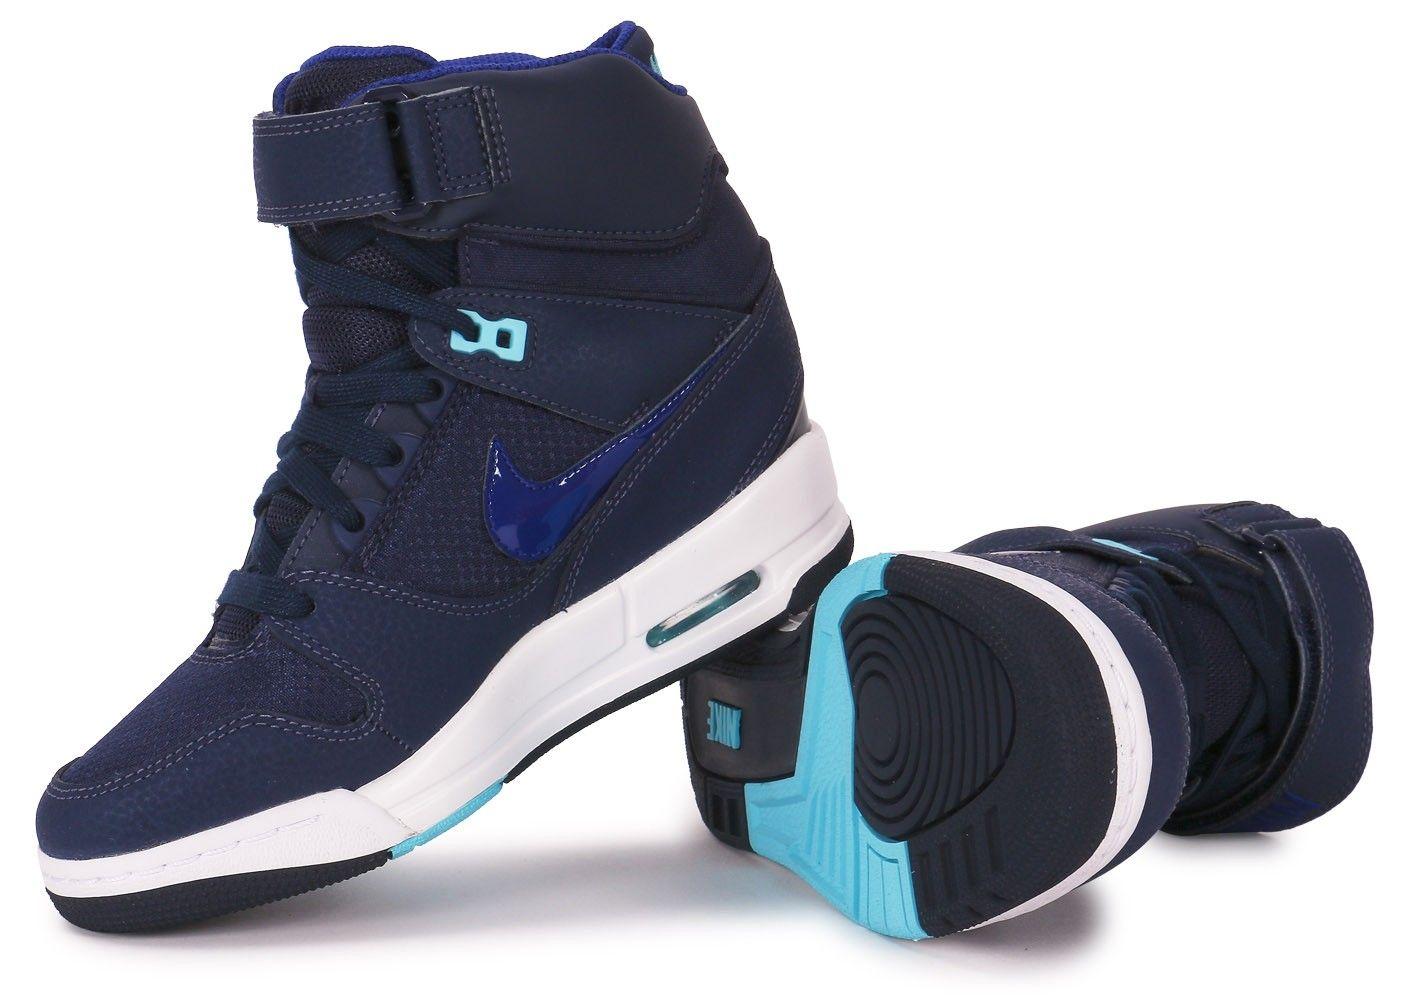 Nike AIR REVOLUTION SKY HI BLEU MARINE - Chaussures Nike - Chausport